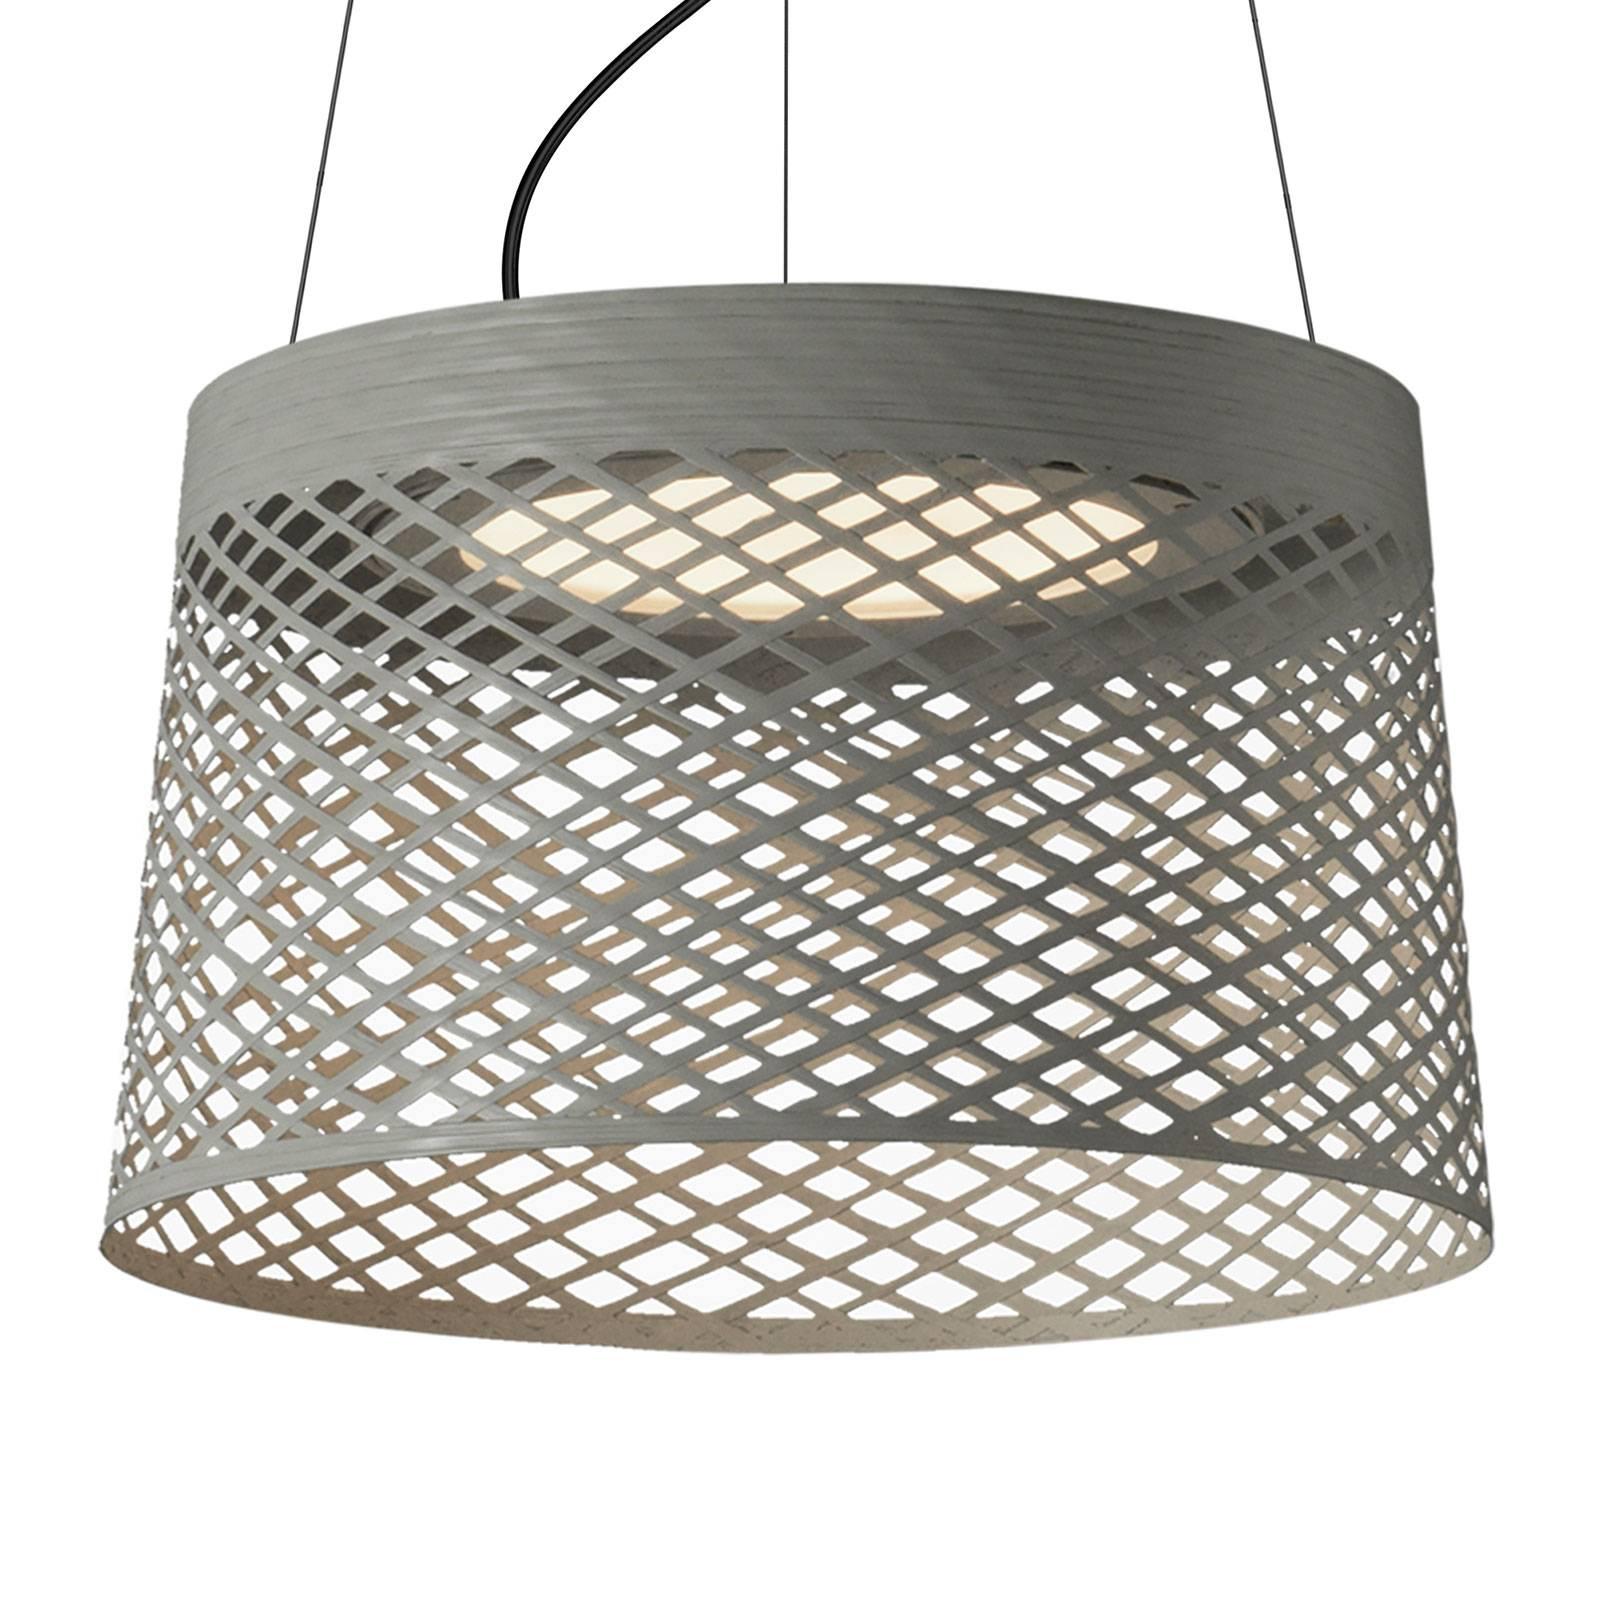 Foscarini Twiggy Grid LED-Hängeleuchte, greige